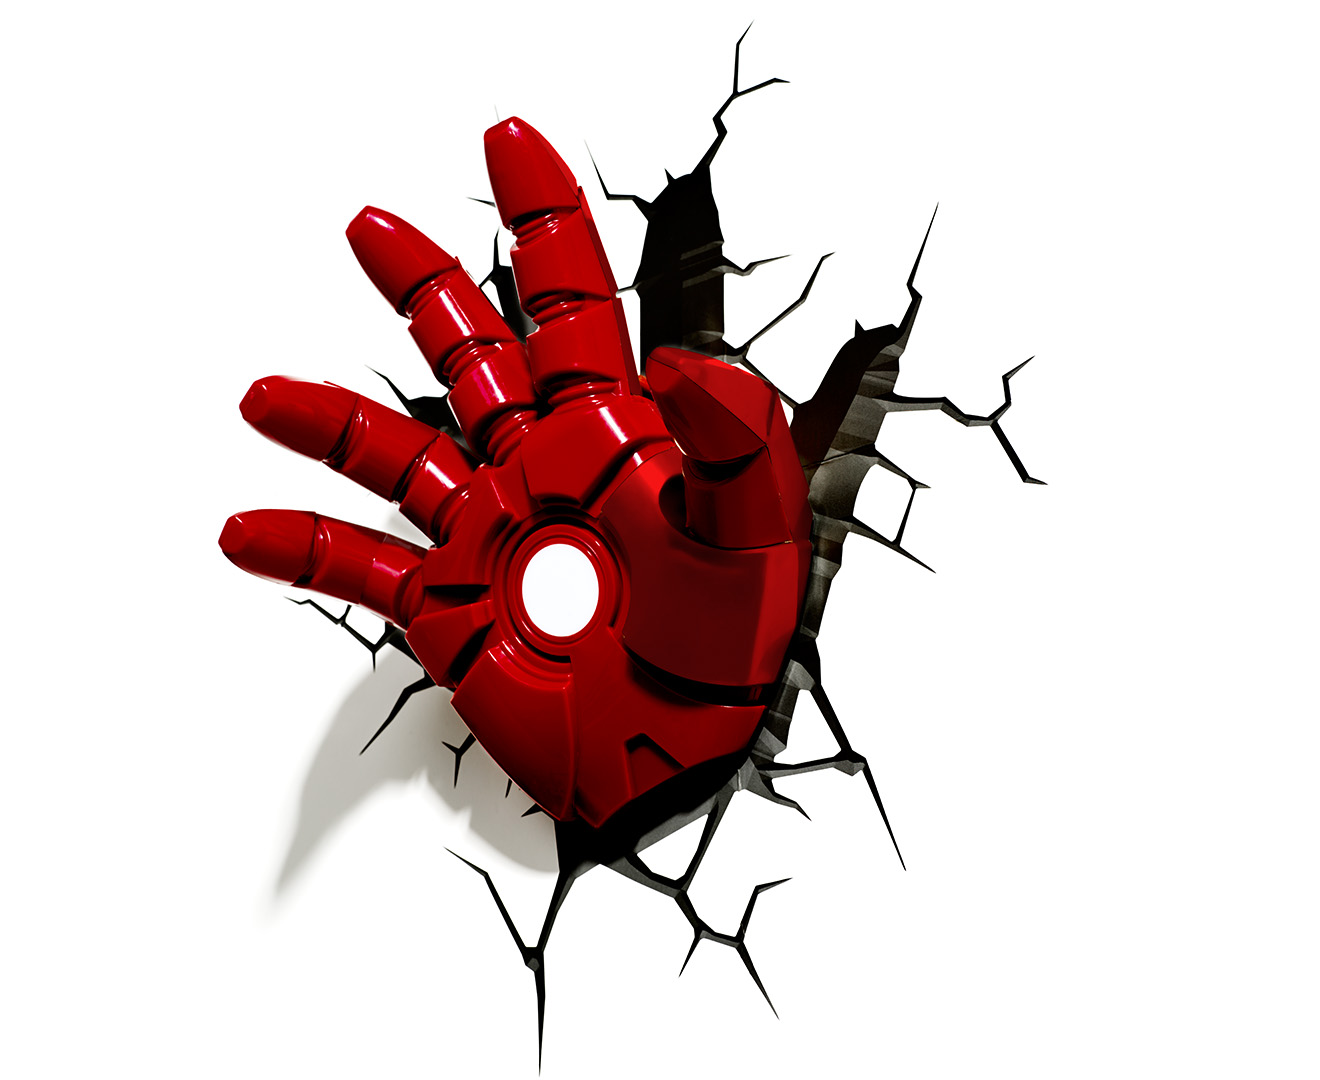 Marvel Wall Lights Iron Man : 3D Marvel Iron Man Hand Wall Light - Red eBay